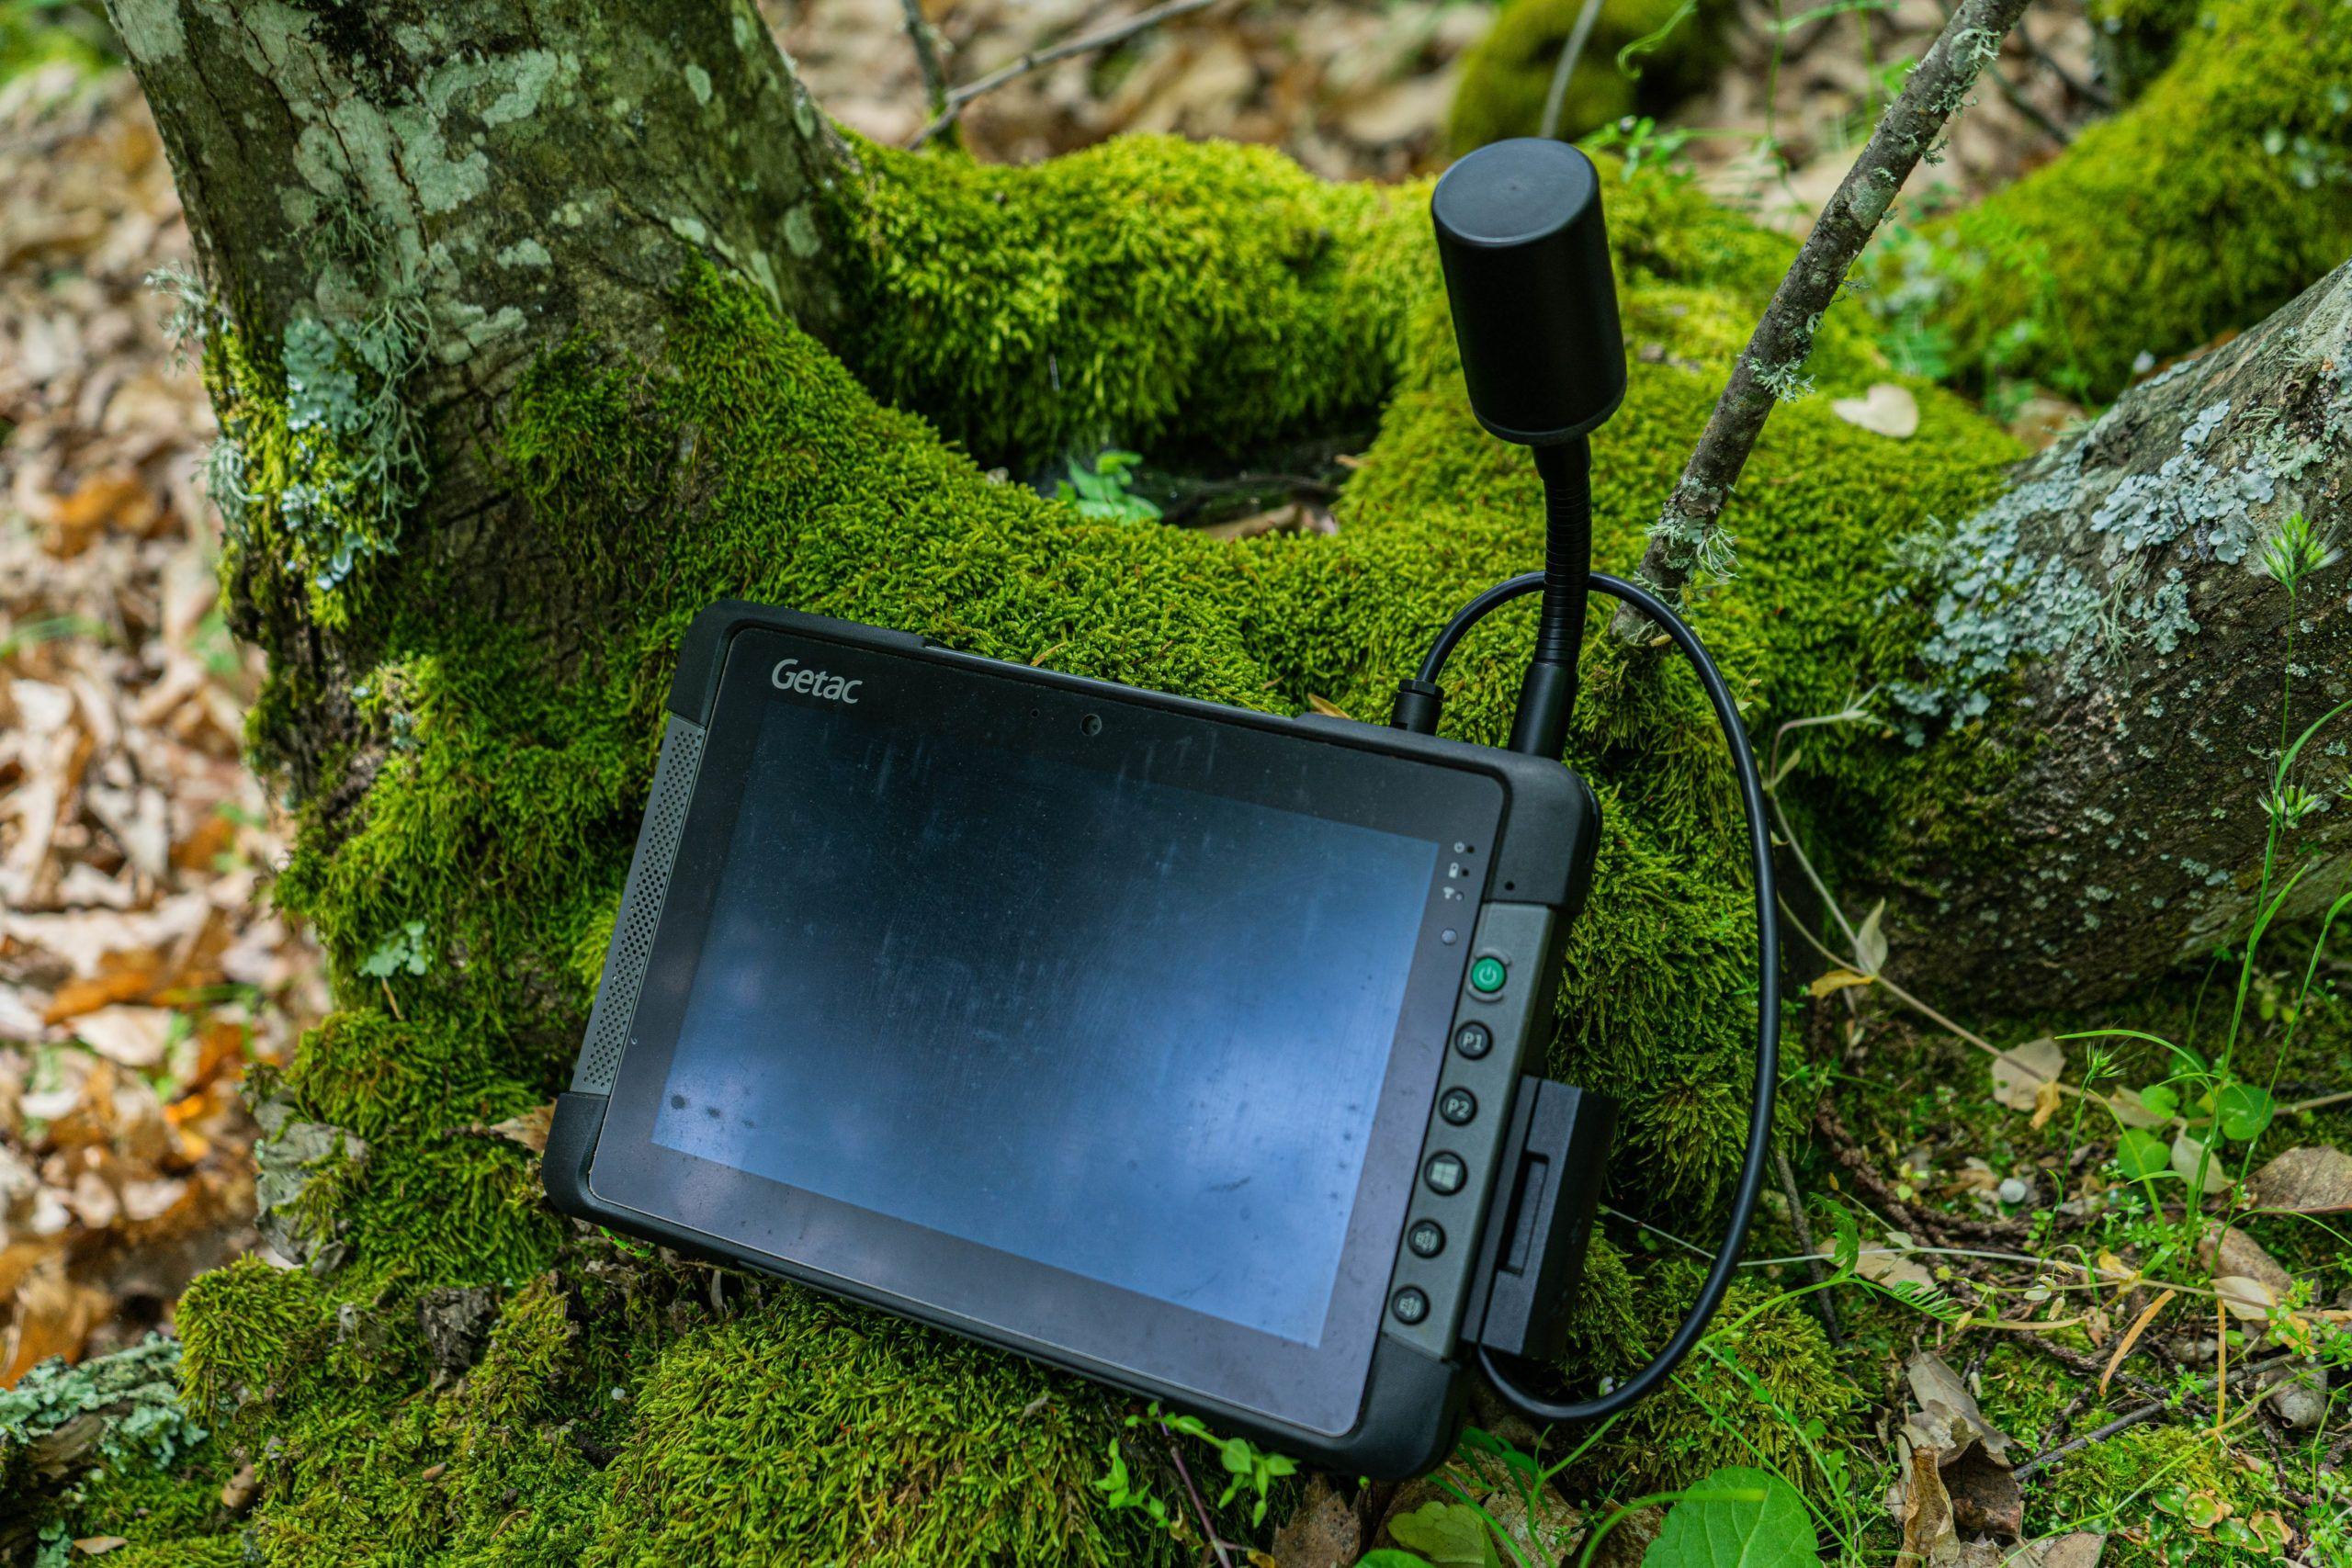 Tablet Getac T800 con GPS PPM 10XX, Field-Map Forest Colelctor